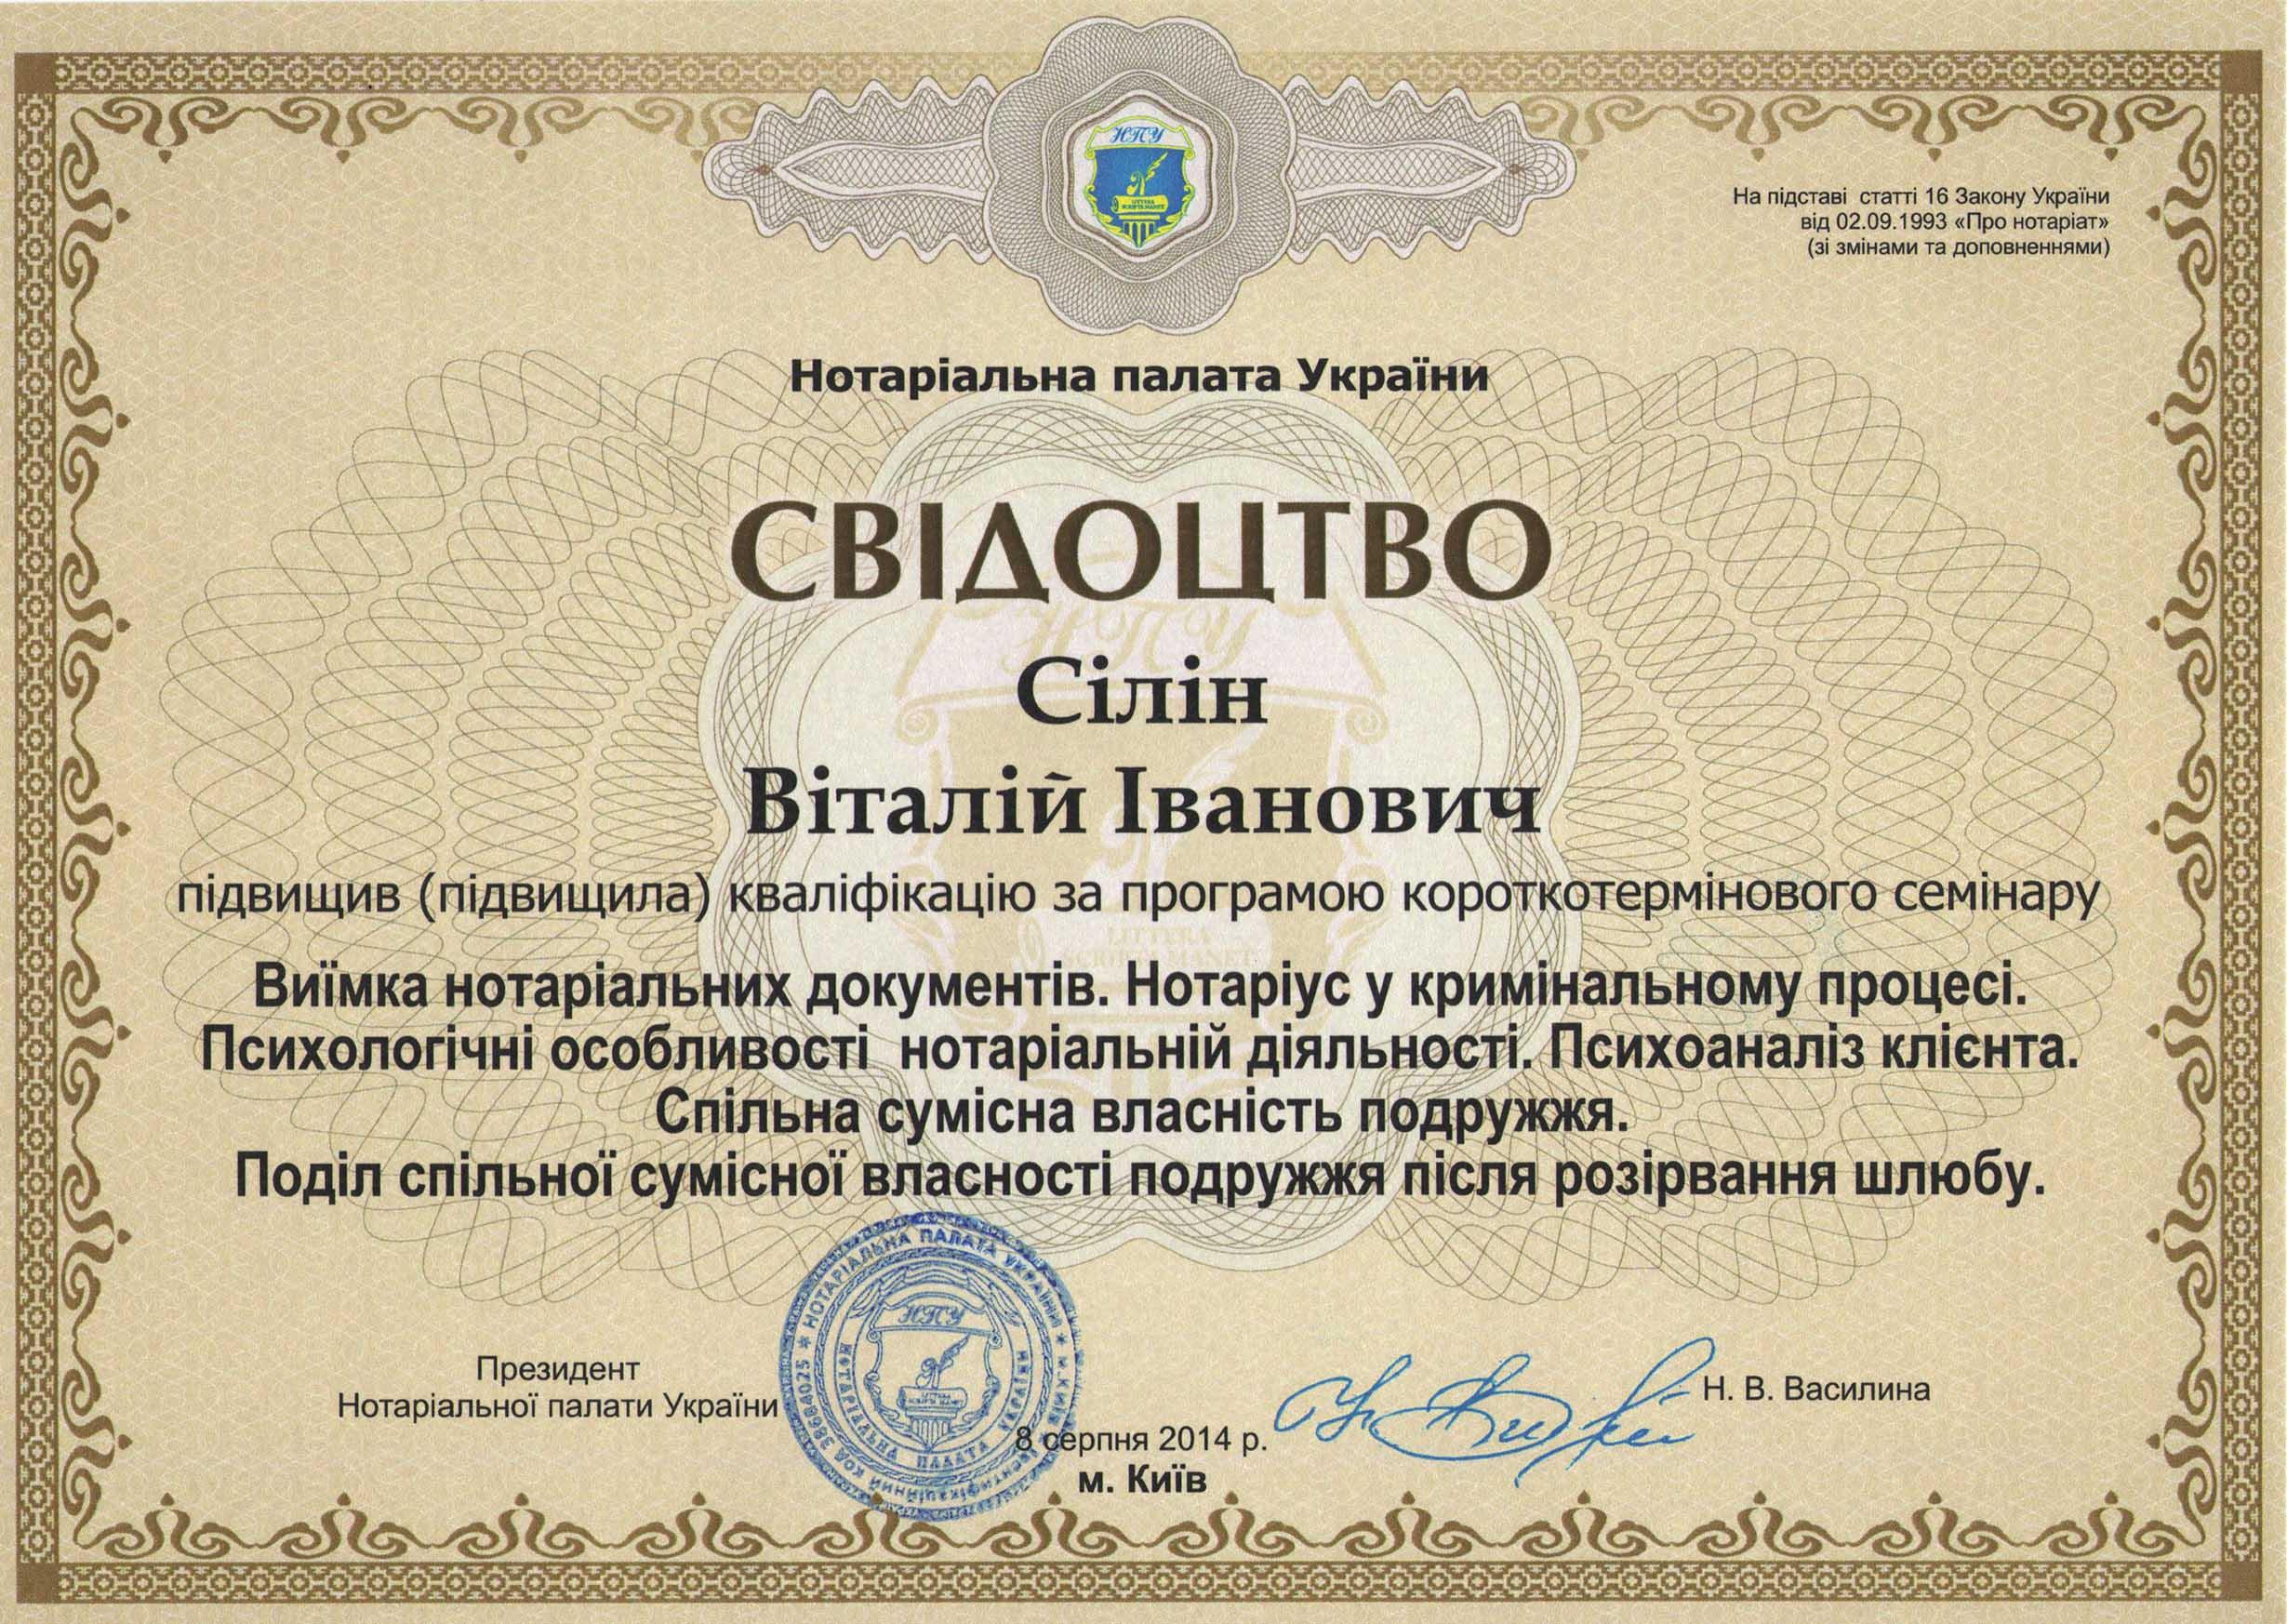 сертификат Силин7